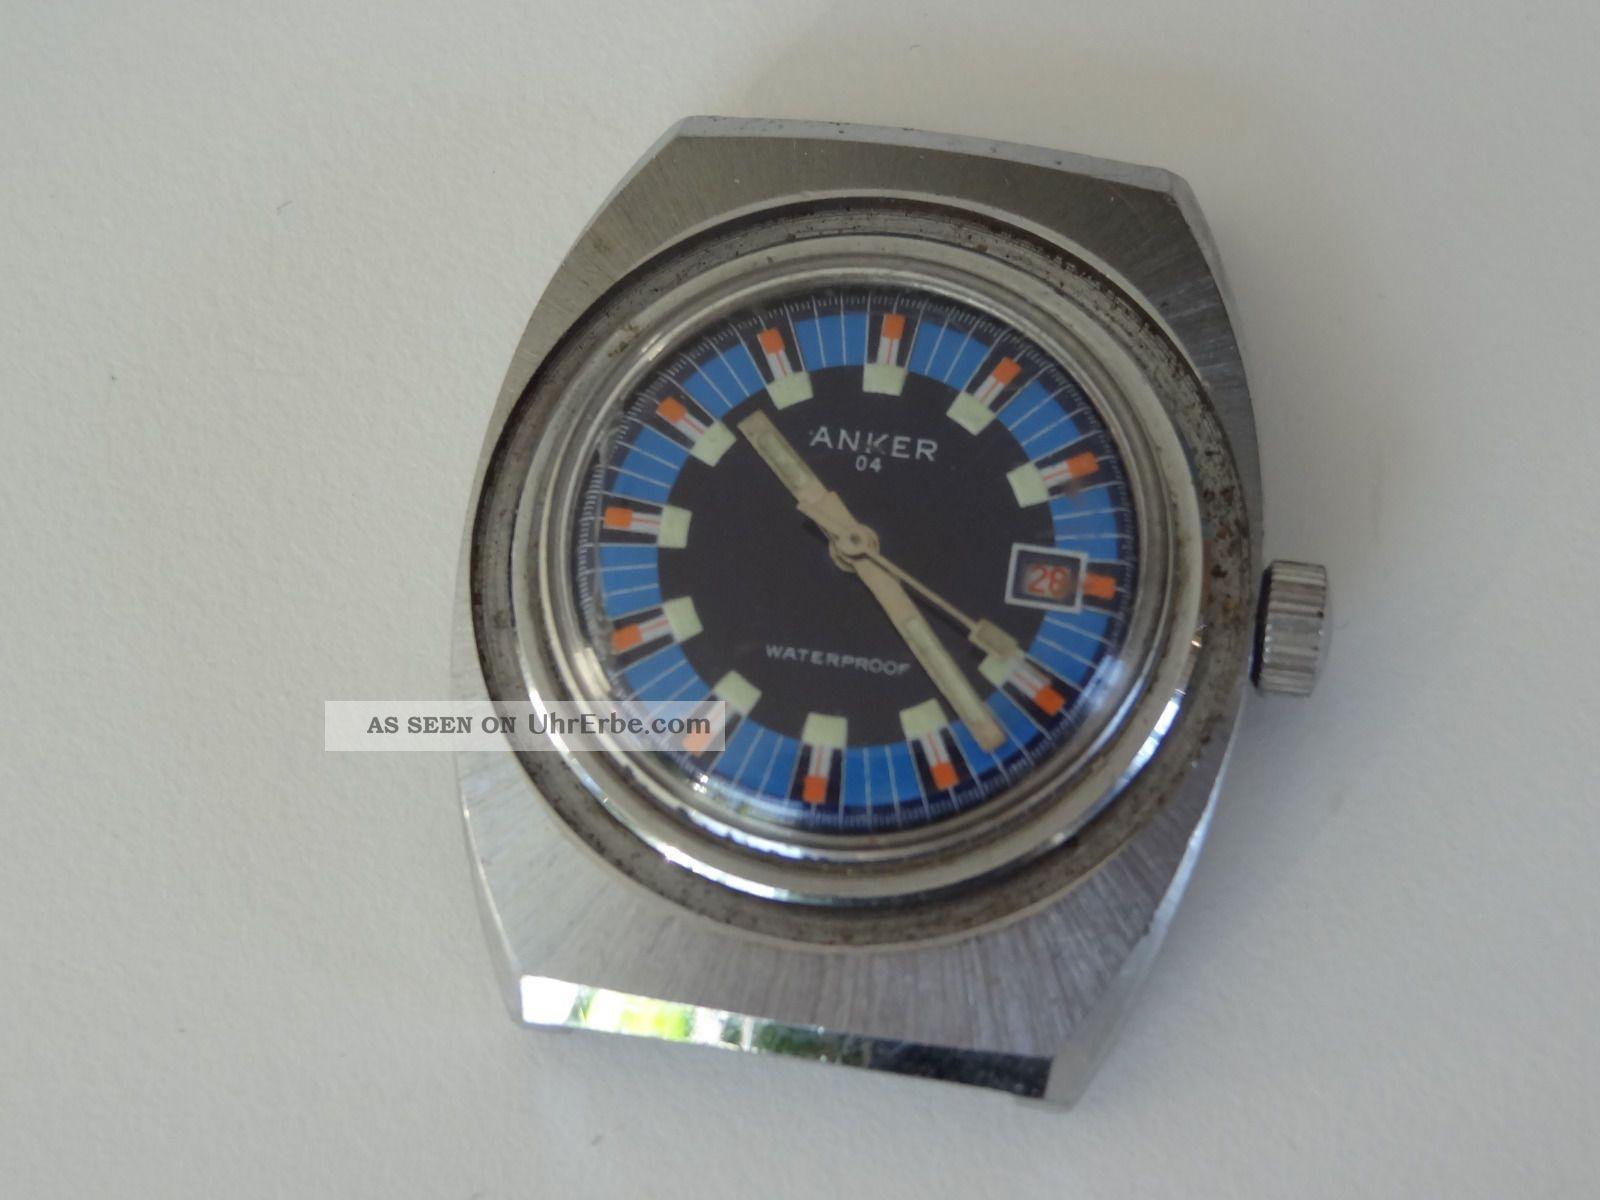 Anker 04 Vintage Taucheruhr Armbanduhr Herrenuhr Handaufzug Armbanduhren Bild